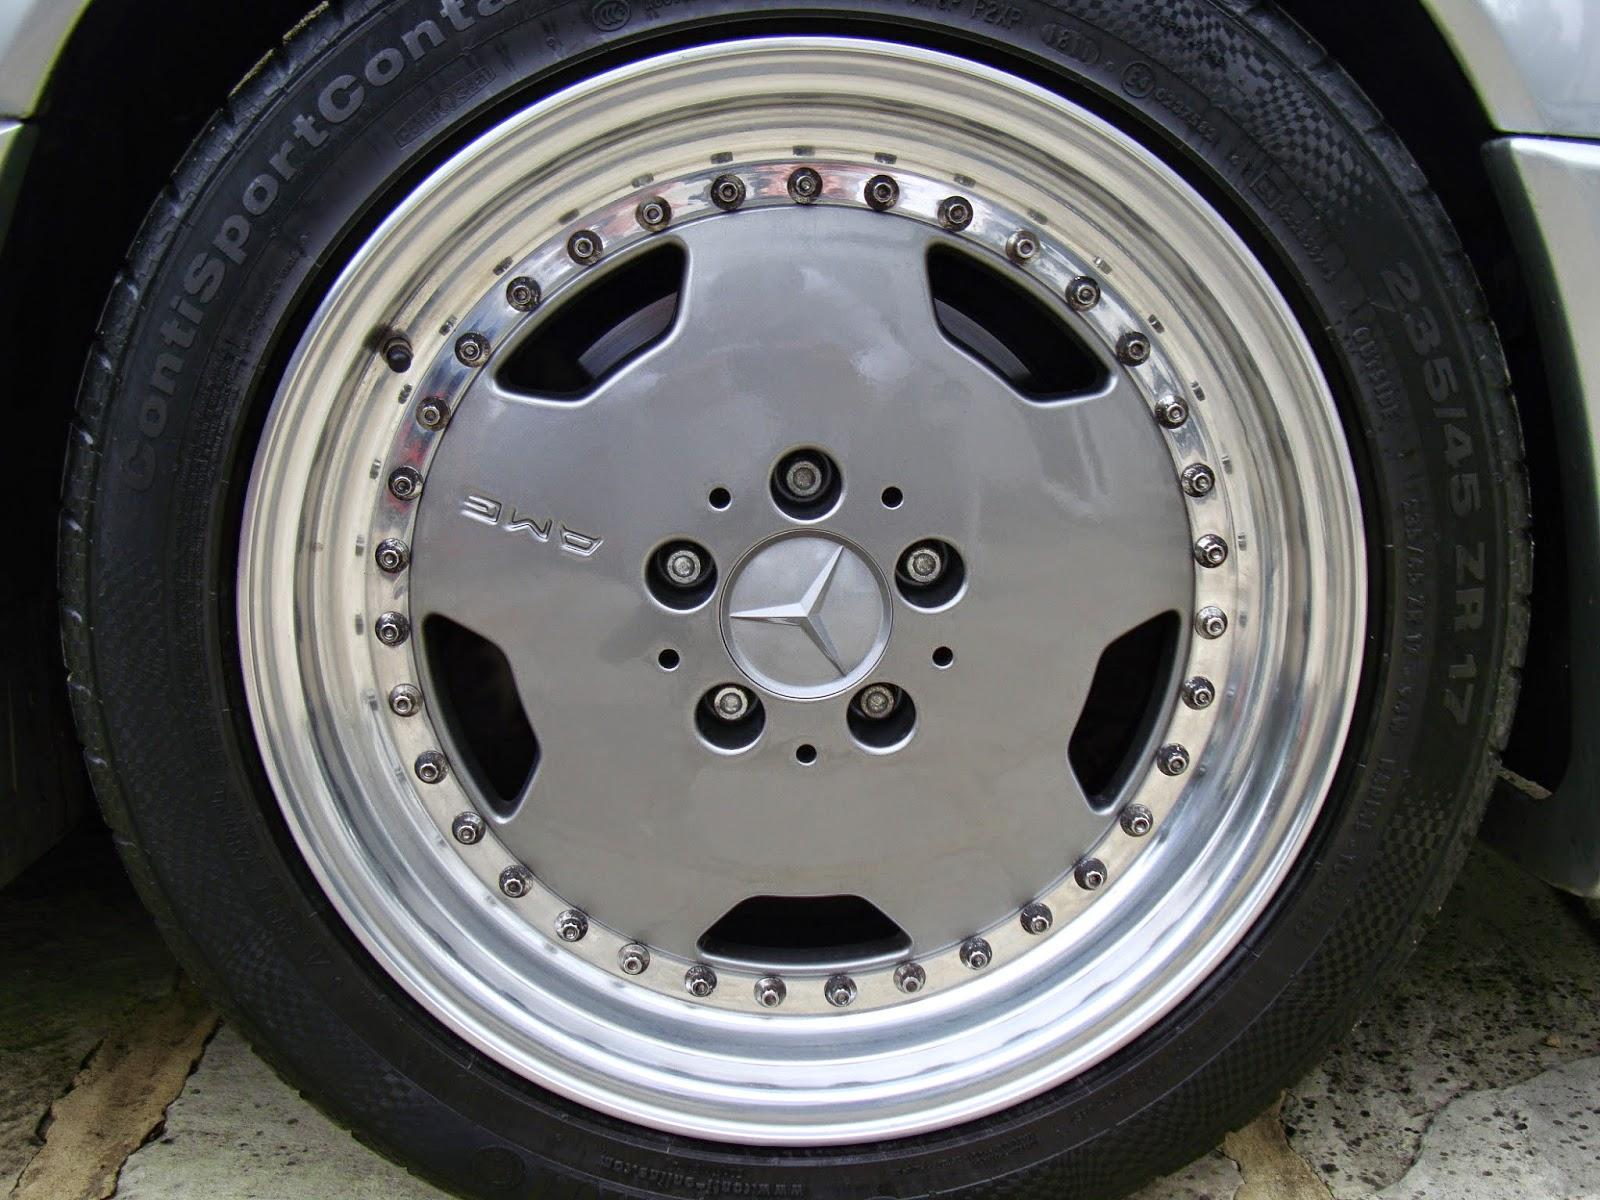 Mercedes Benz R129 Sl500 6 0 Amg Benztuning